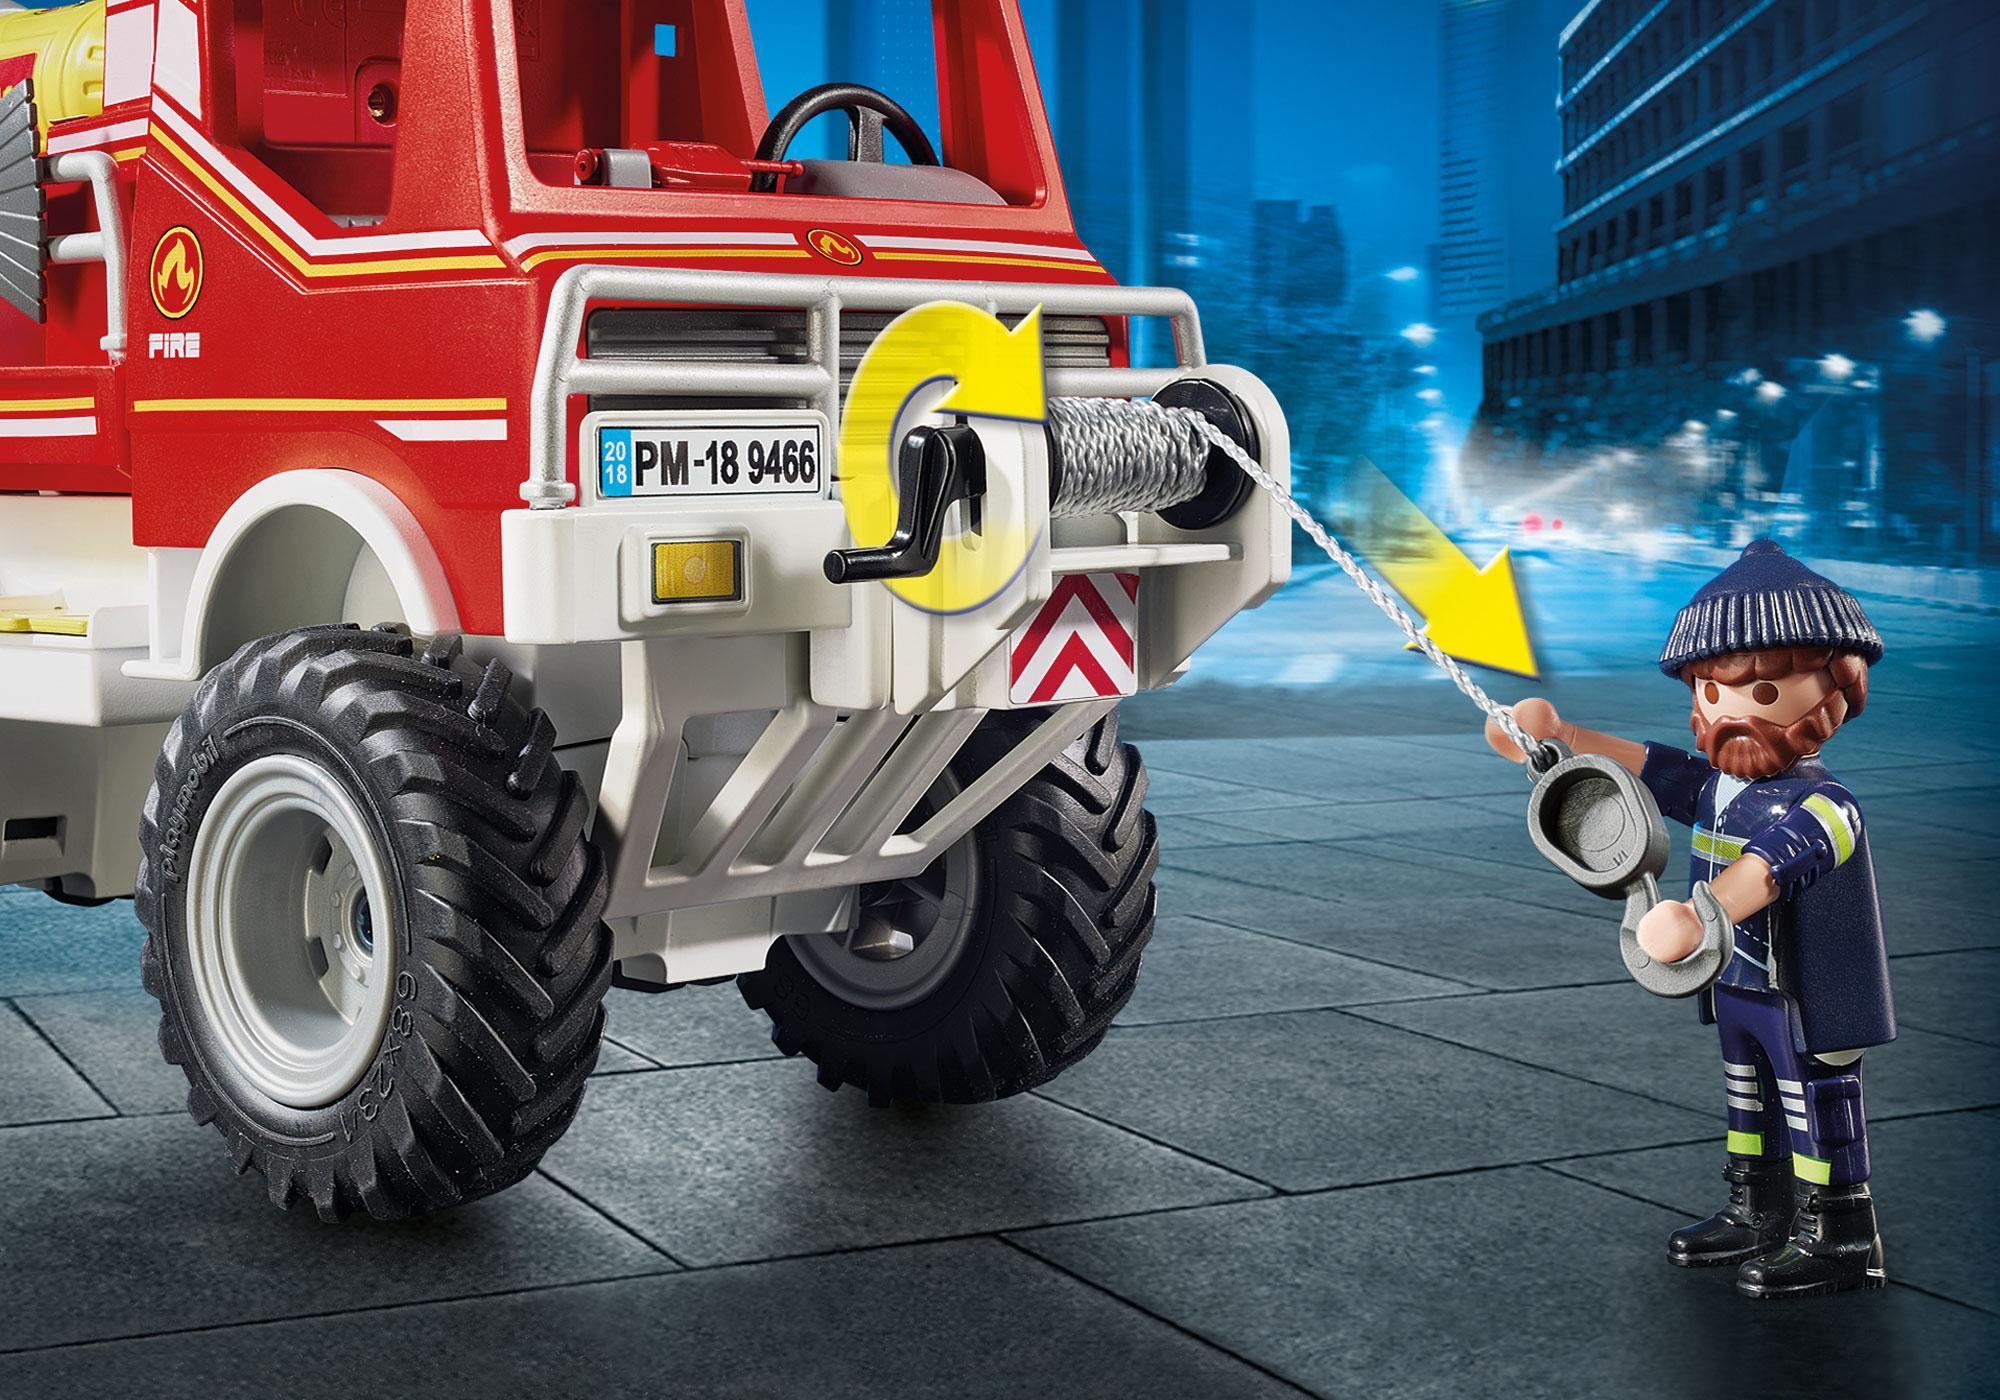 http://media.playmobil.com/i/playmobil/9466_product_extra1